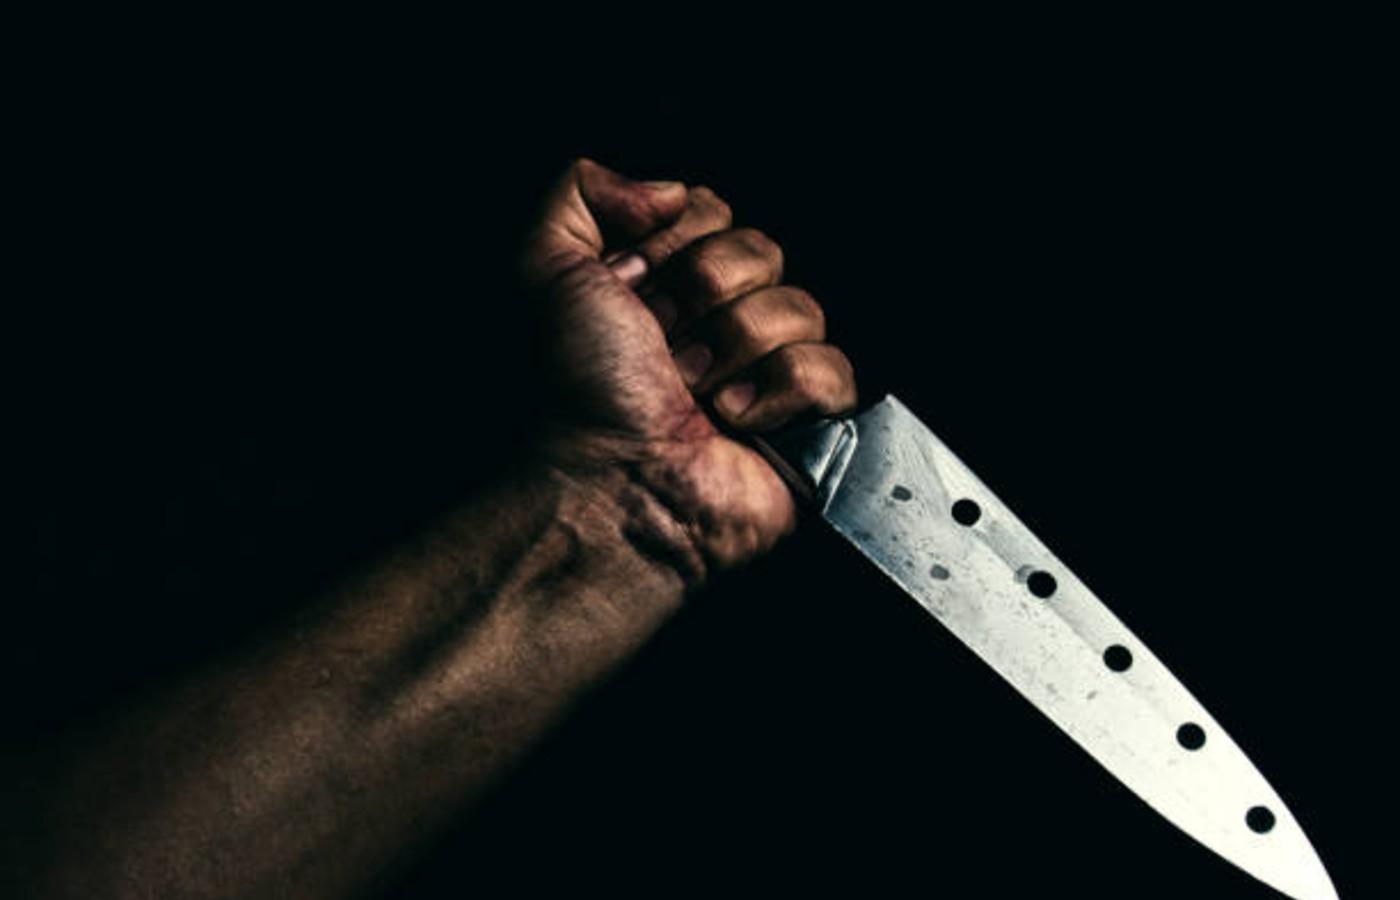 Headlines - Woman Knives Neighbour's Son Over A Trespassing Quarrel!